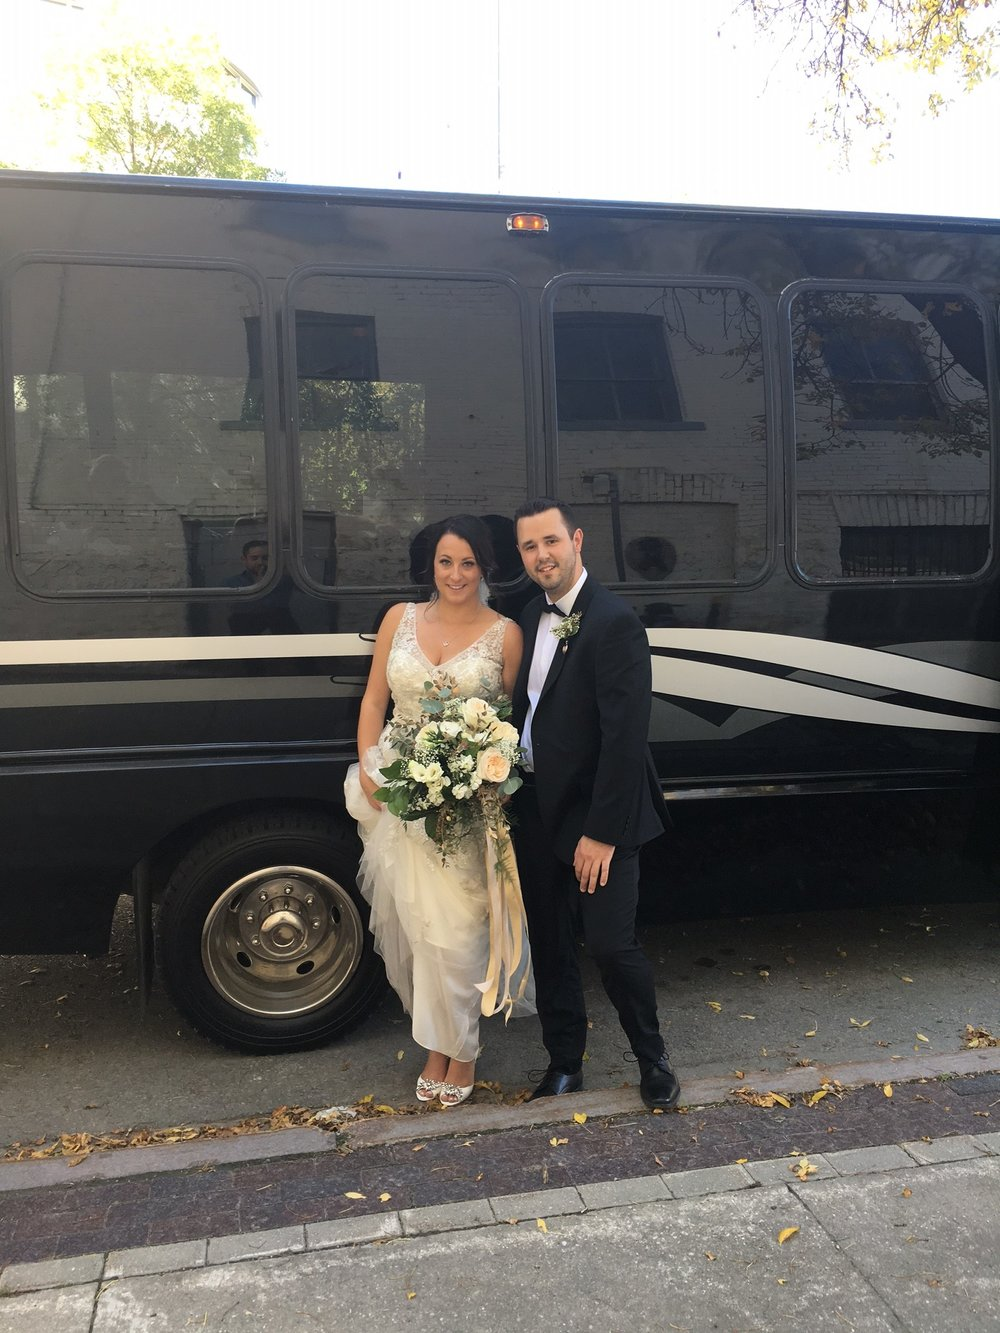 Danielle and Matthew